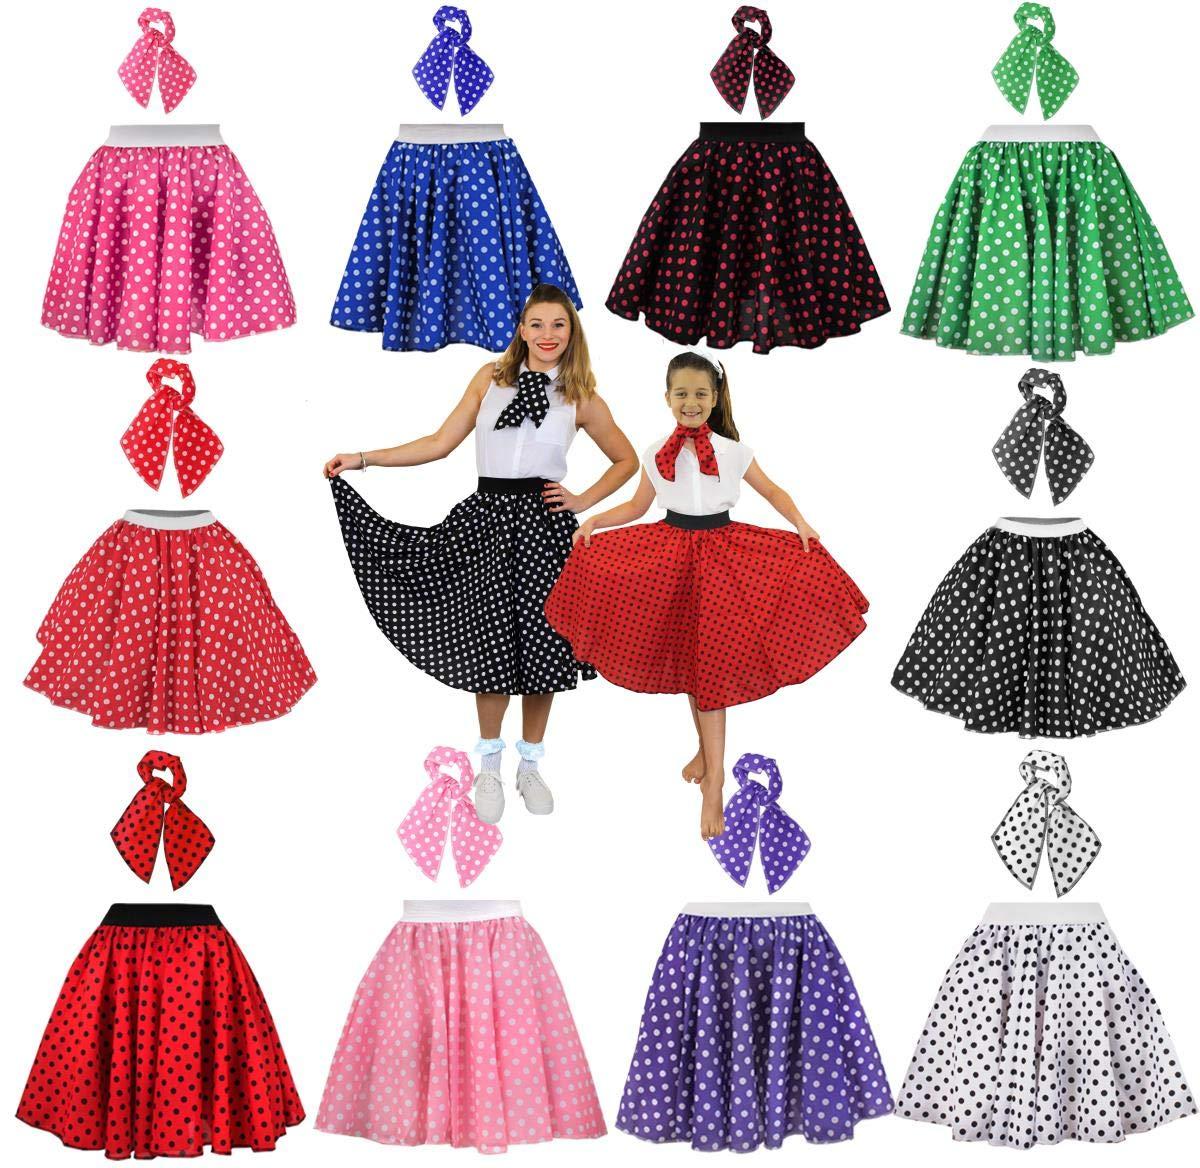 Petticoat Mini Tutu Underskirt Red Black White One Size 8-12 Fancy Dress